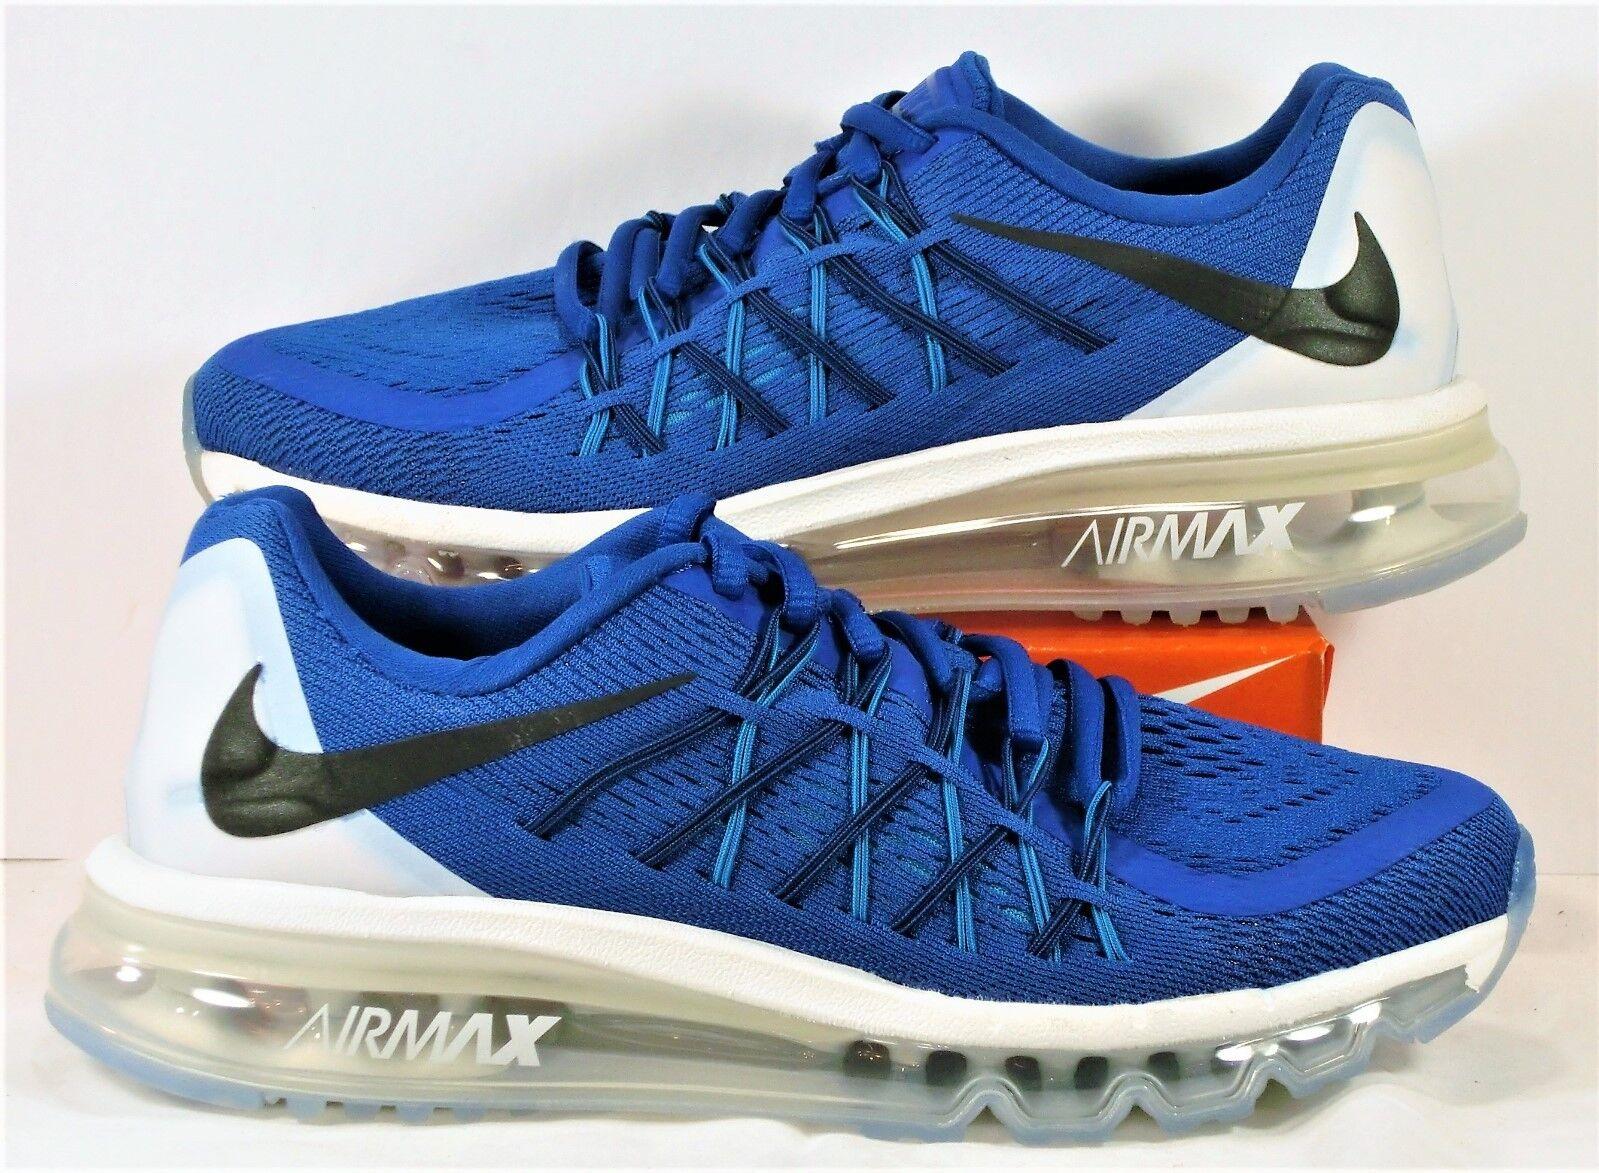 Nike Air Max 2015 GS Királyi Kék &Fehér Running Womens 8 Sz 6.5Y ÚJ 705457 401